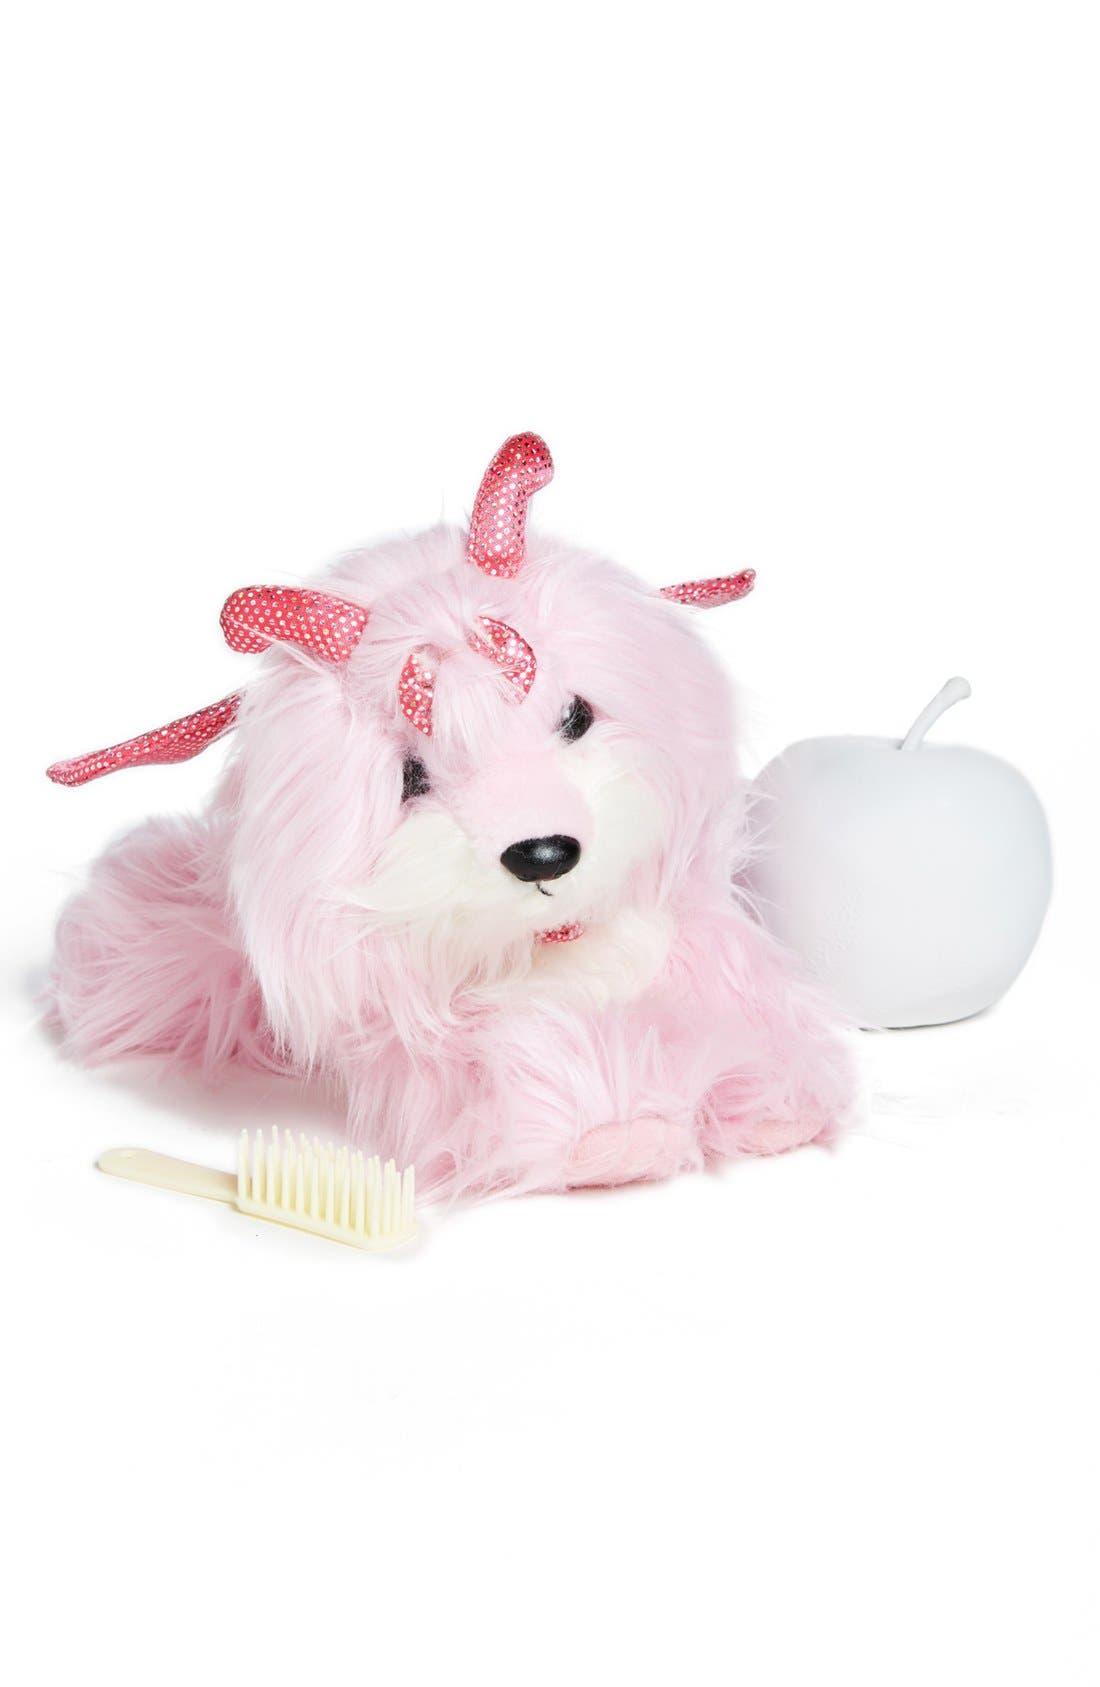 Alternate Image 1 Selected - Aurora World Toys 'Sugarbug Puppillon' 10 Inch Puppy Dog Stuffed Animal